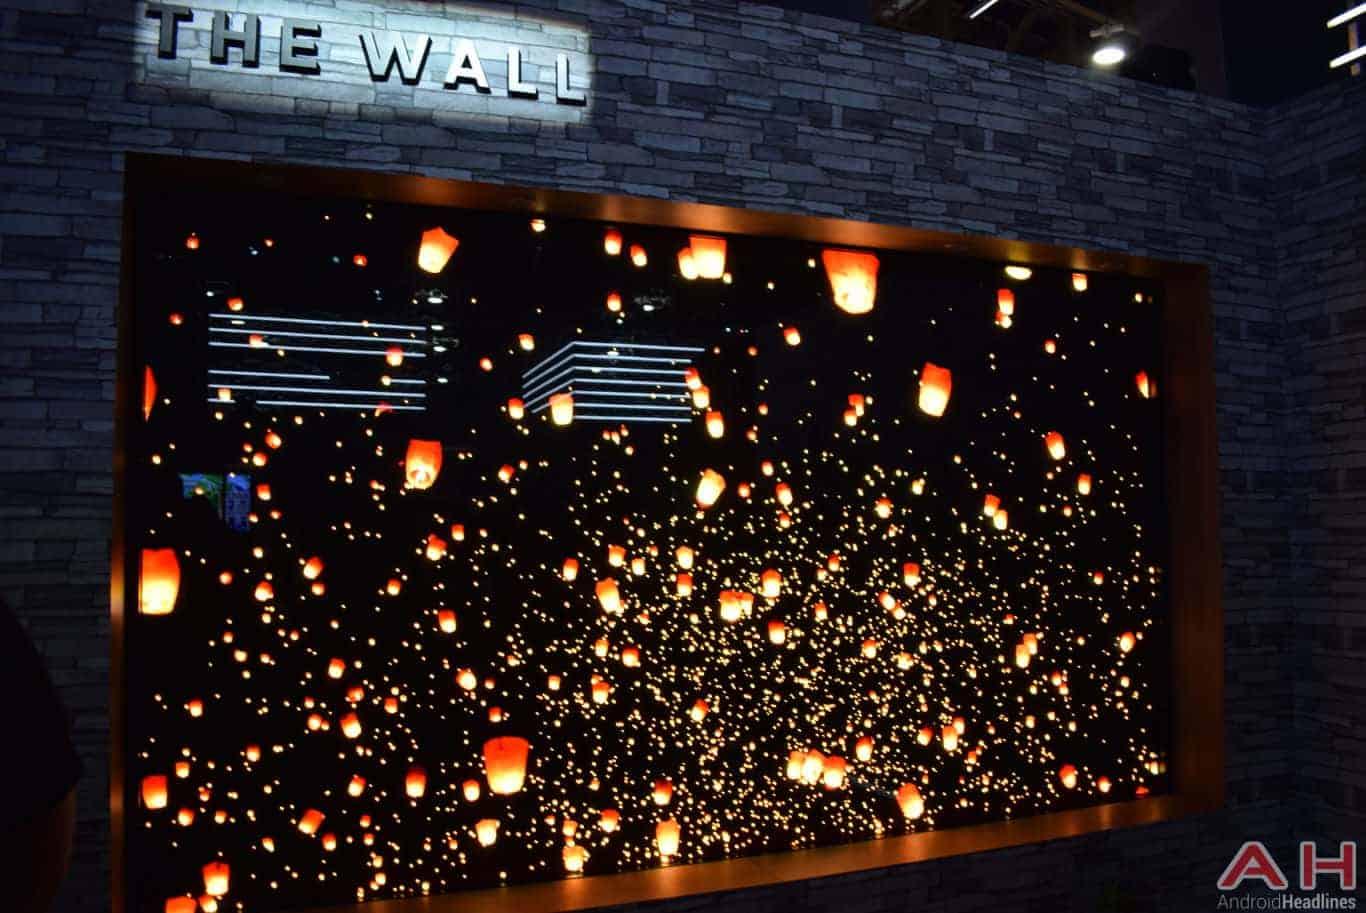 Samsung The Wall Modular MicroLED TV CES 2018 AH 11